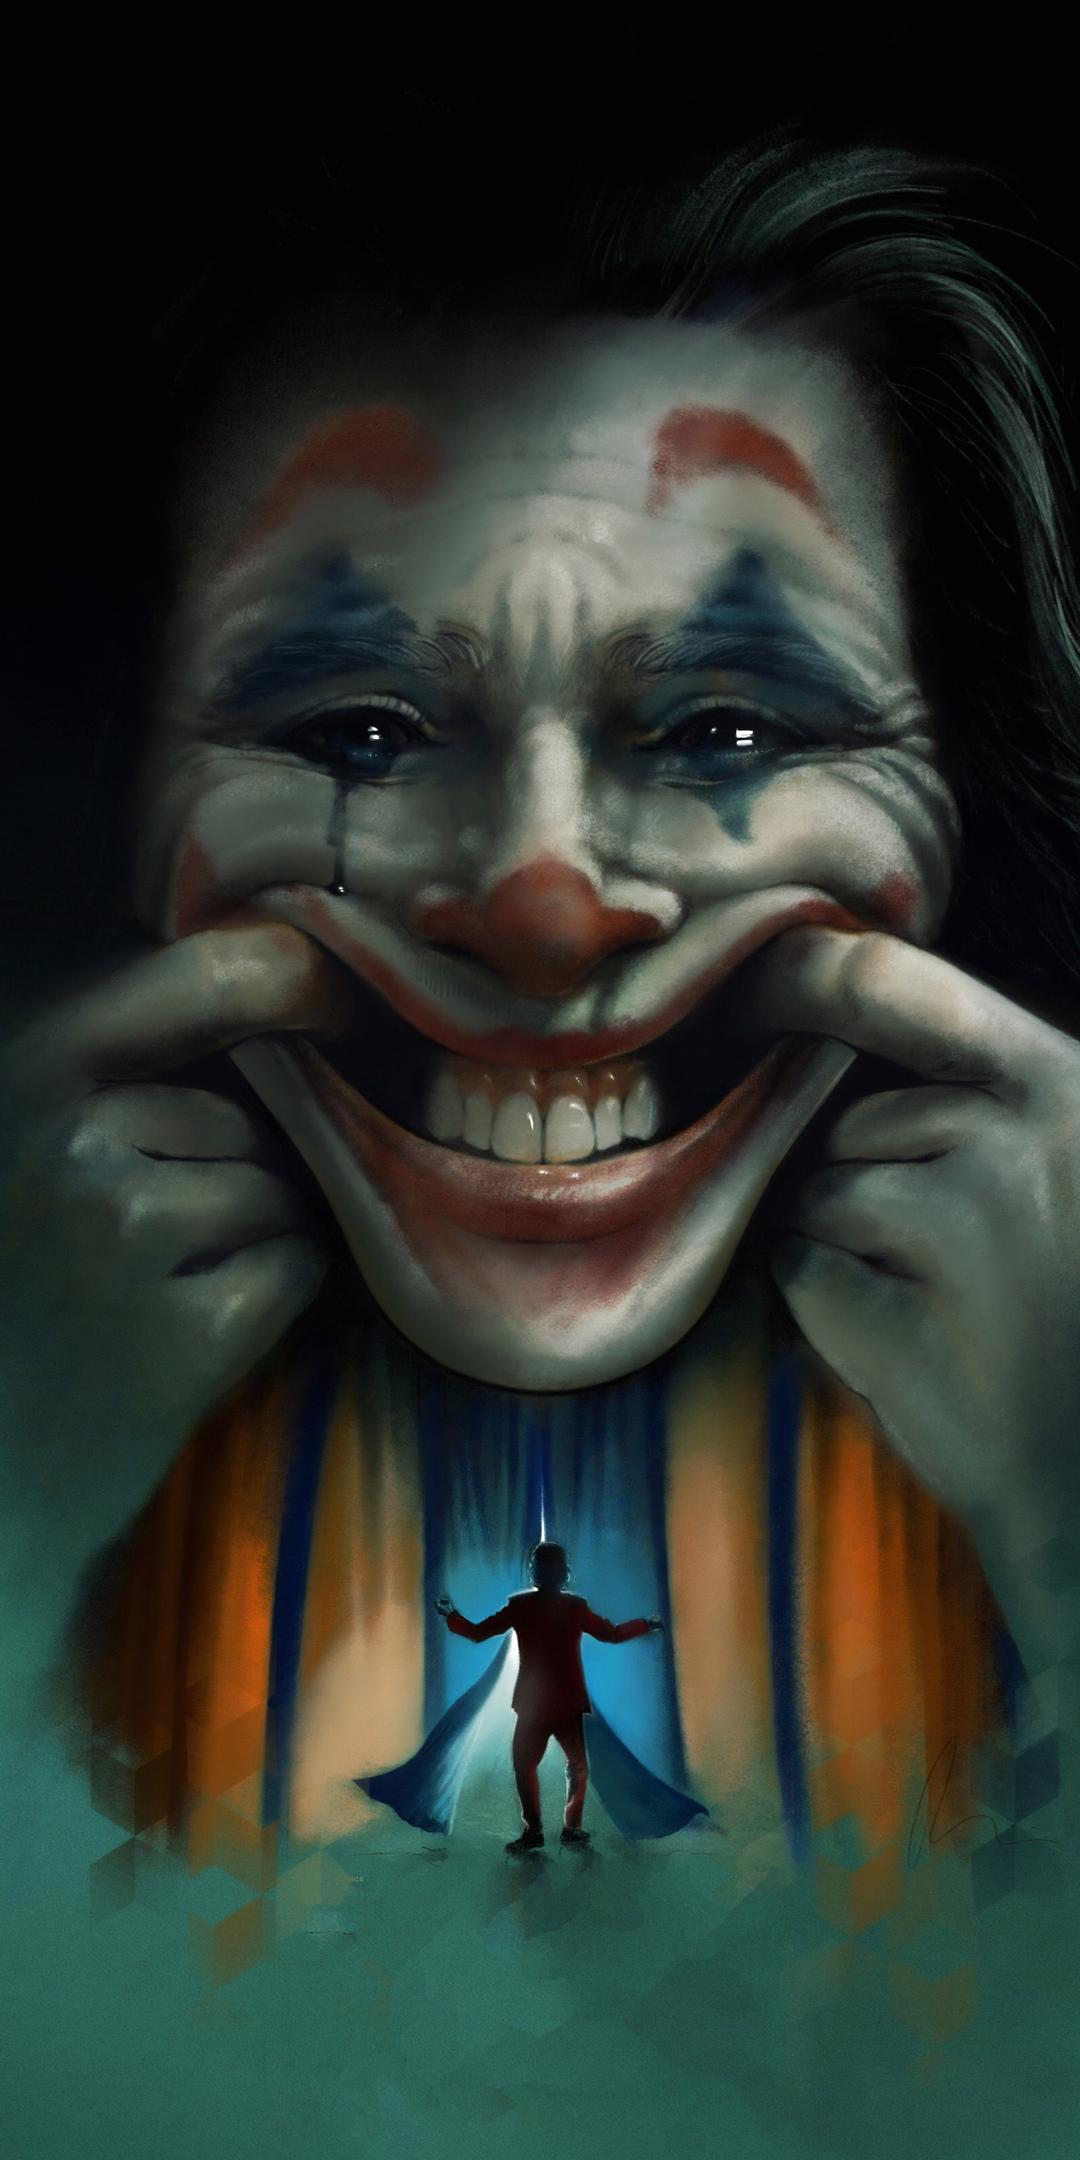 1080x2160 Joker Movie2019 Art One Plus 5t Honor 7x Honor